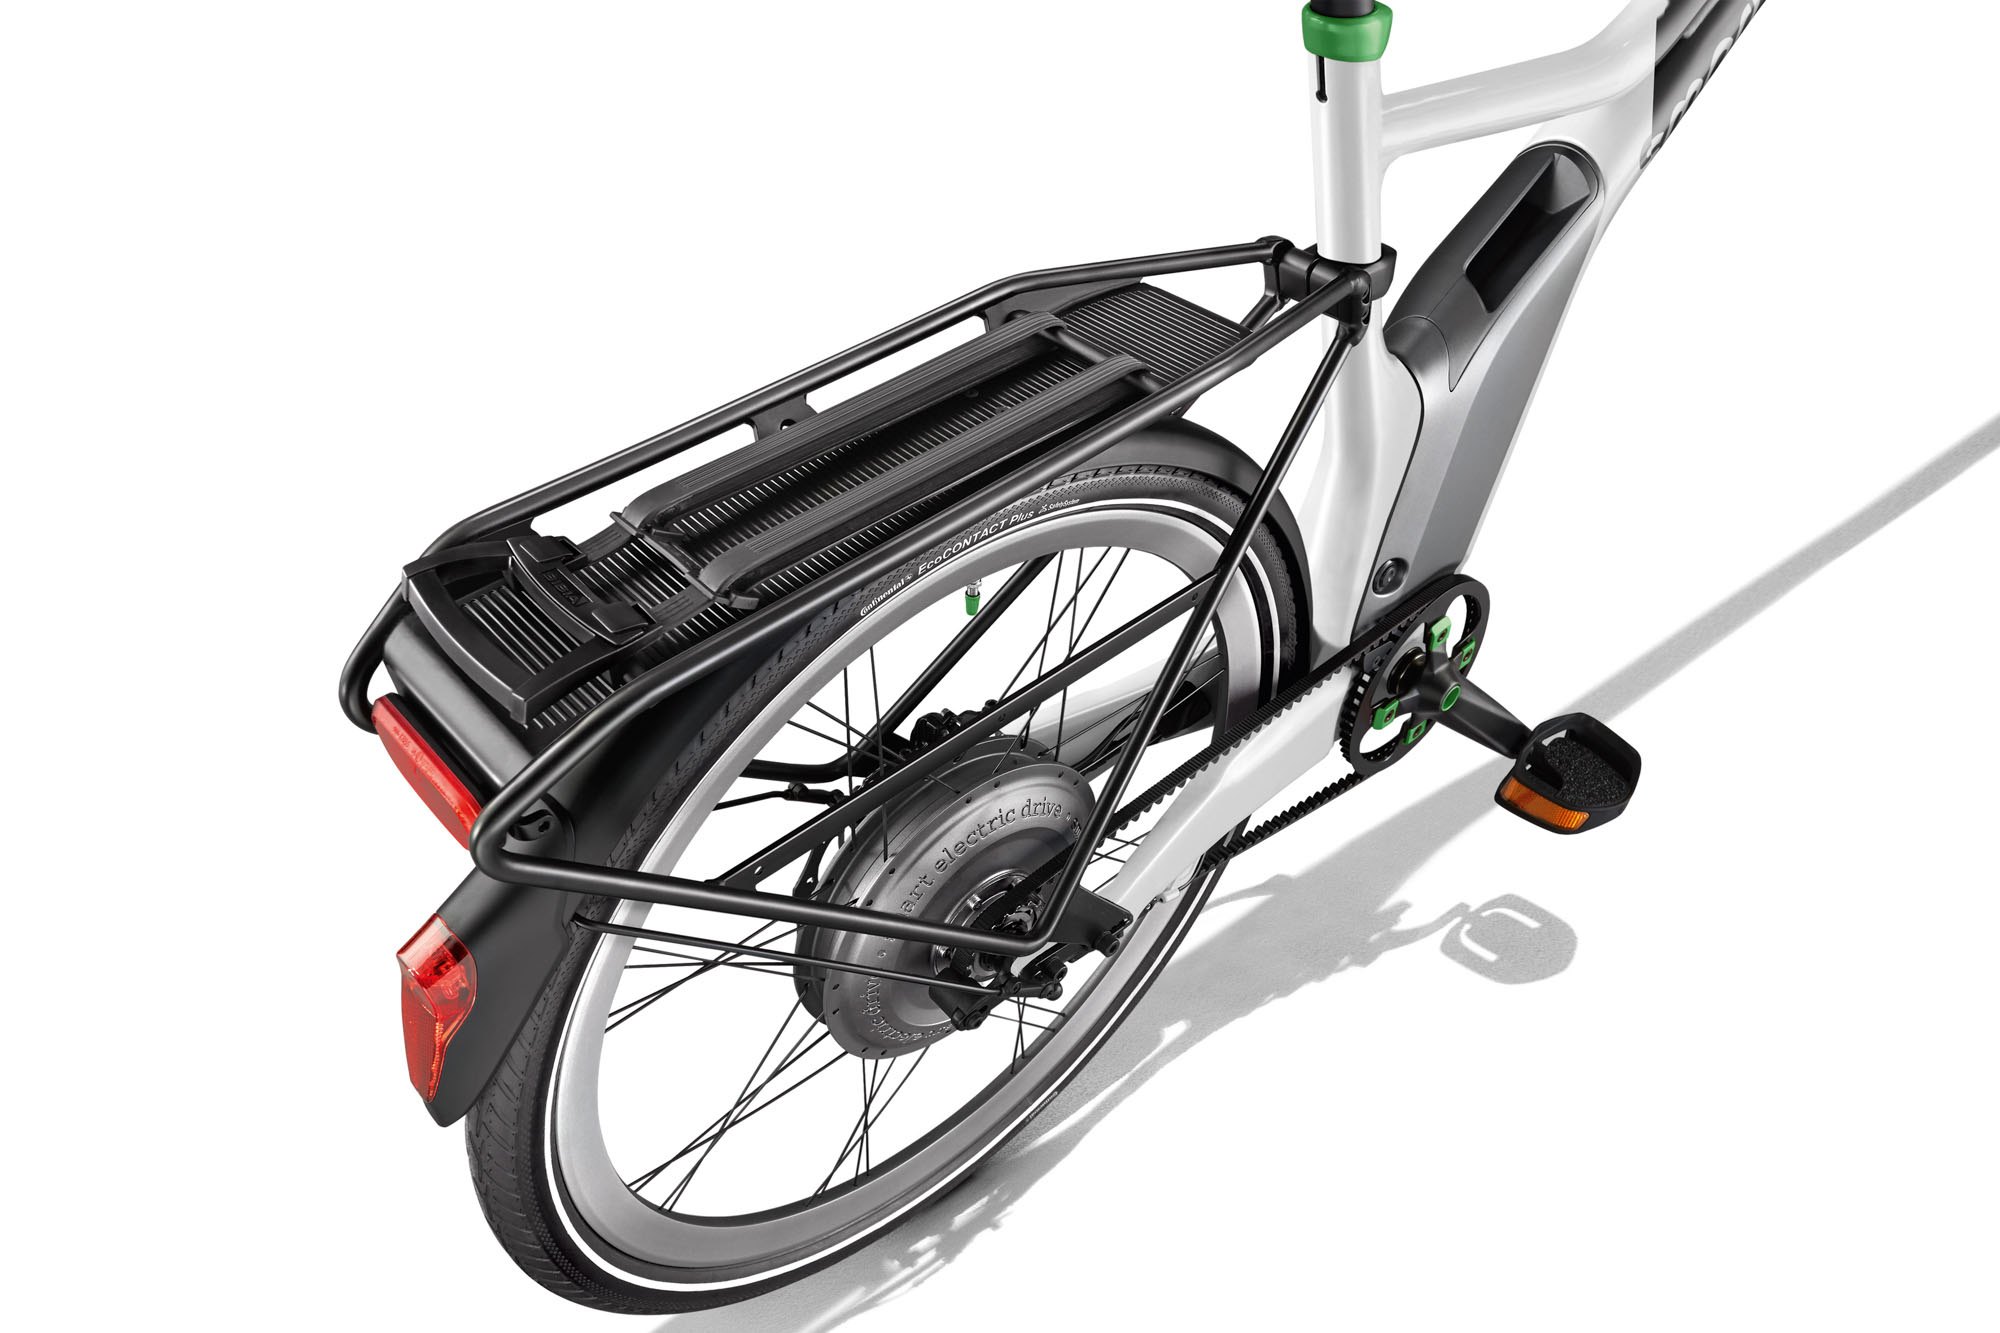 Smart_e_bike_3_4_white_Gepaecktraeger_A